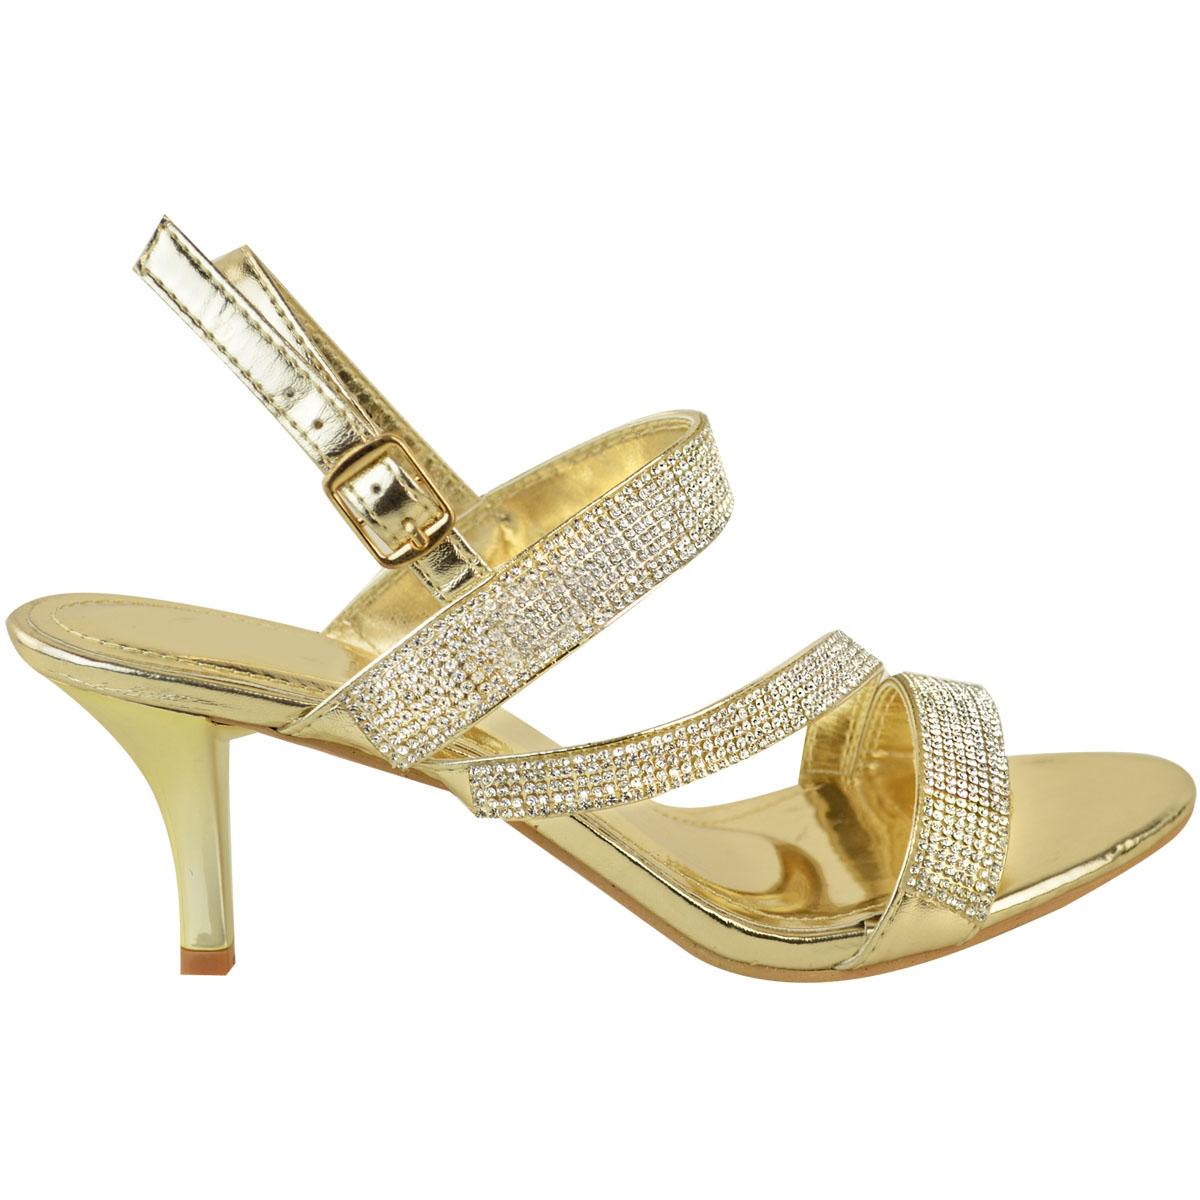 Womens-Ladies-Diamante-Mid-Heel-Prom-Bridal-Wedding-Shoes-Evening-Sandals-Size